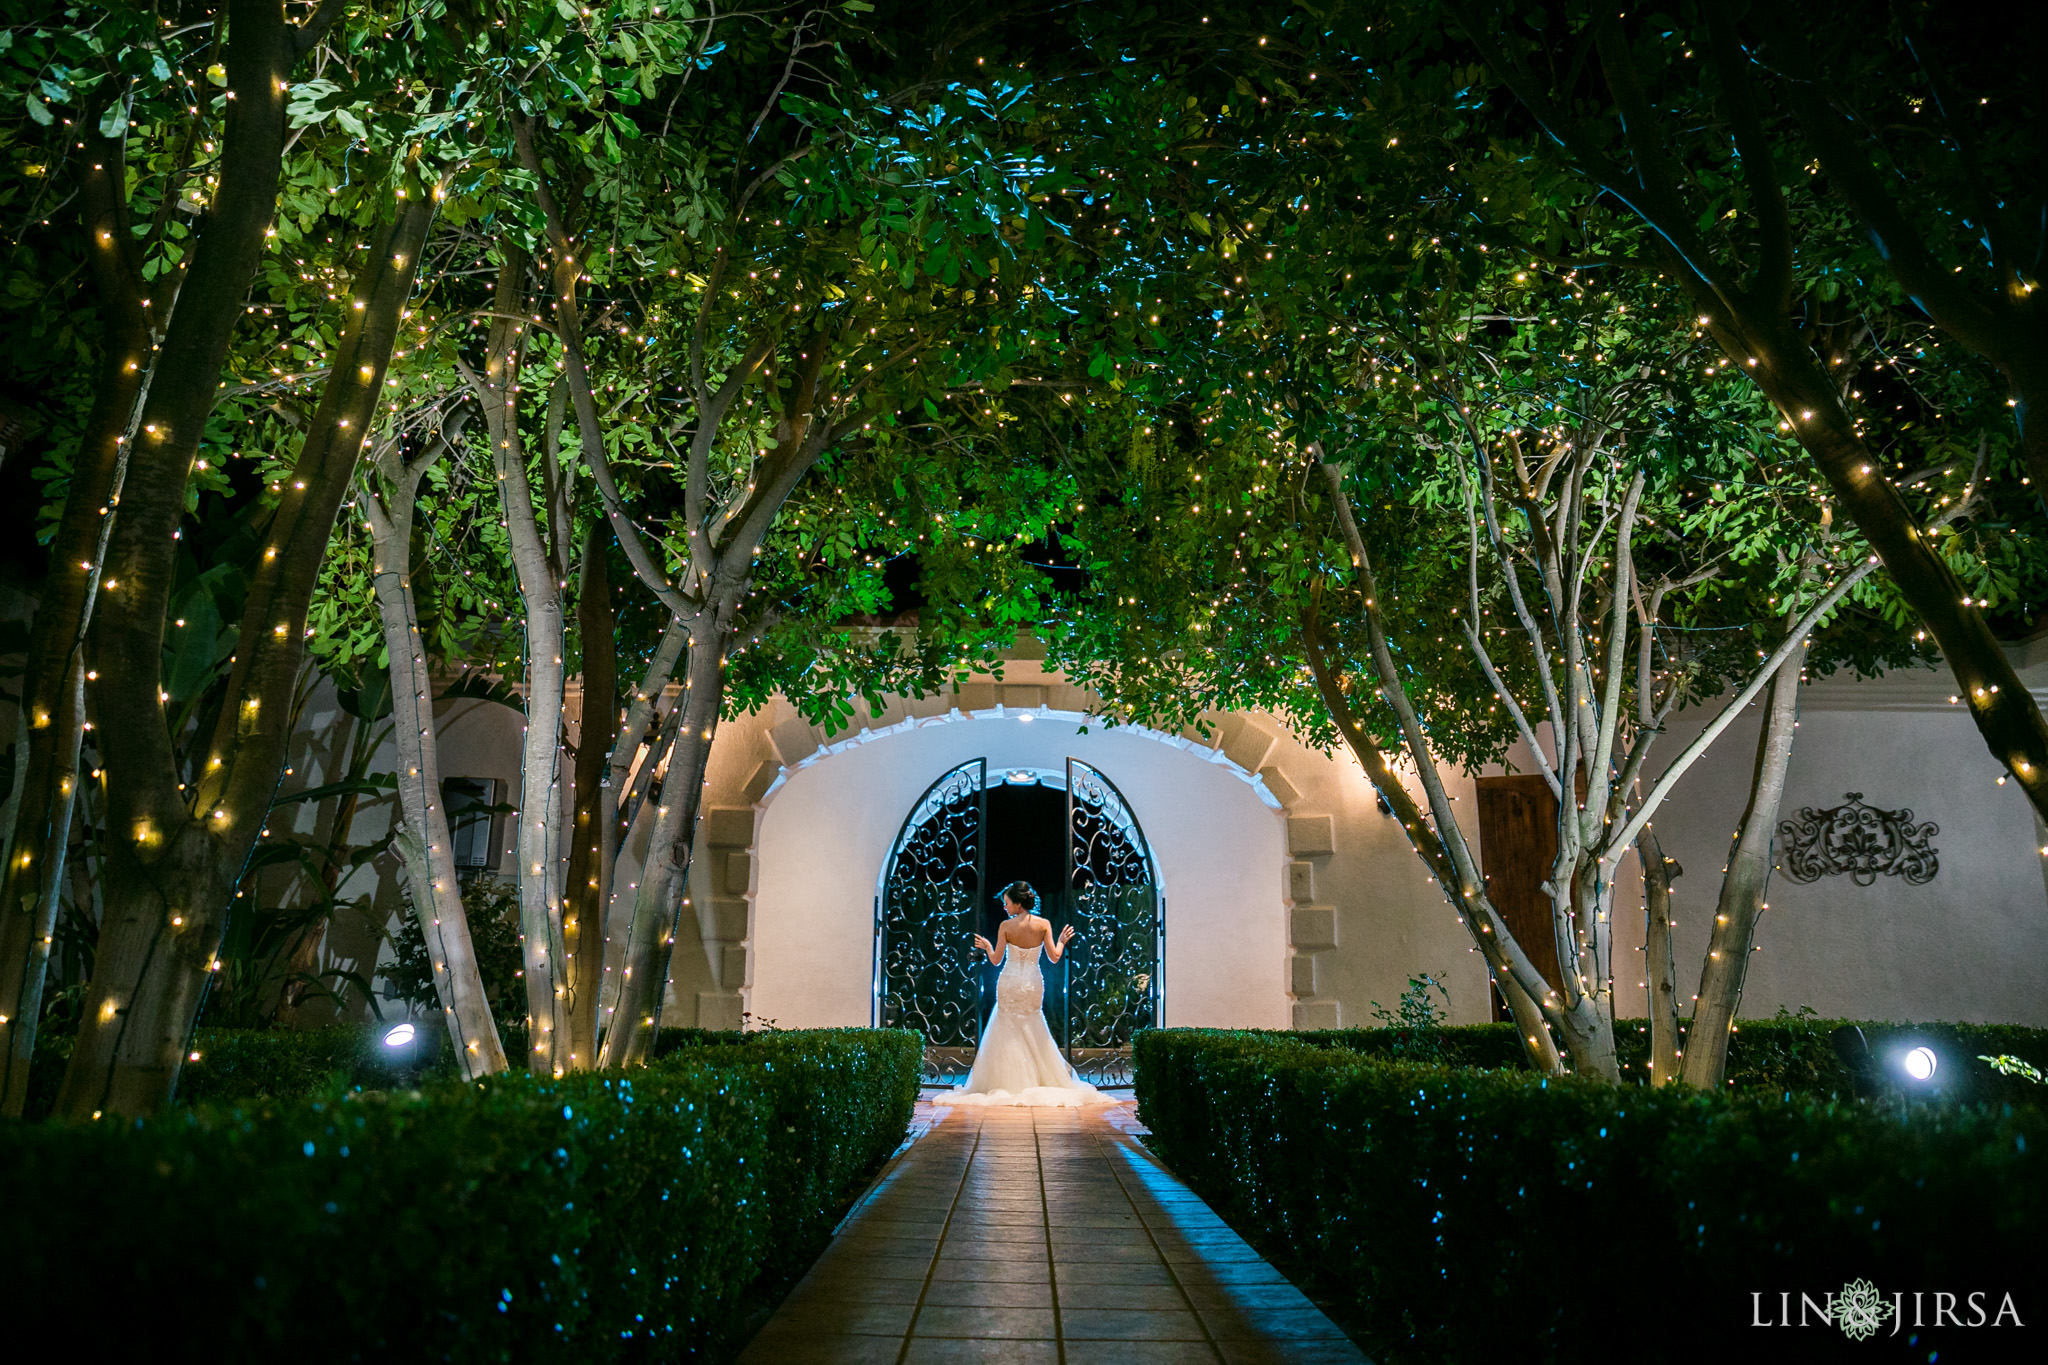 22-villa-de-amore-temecula-wedding-photography